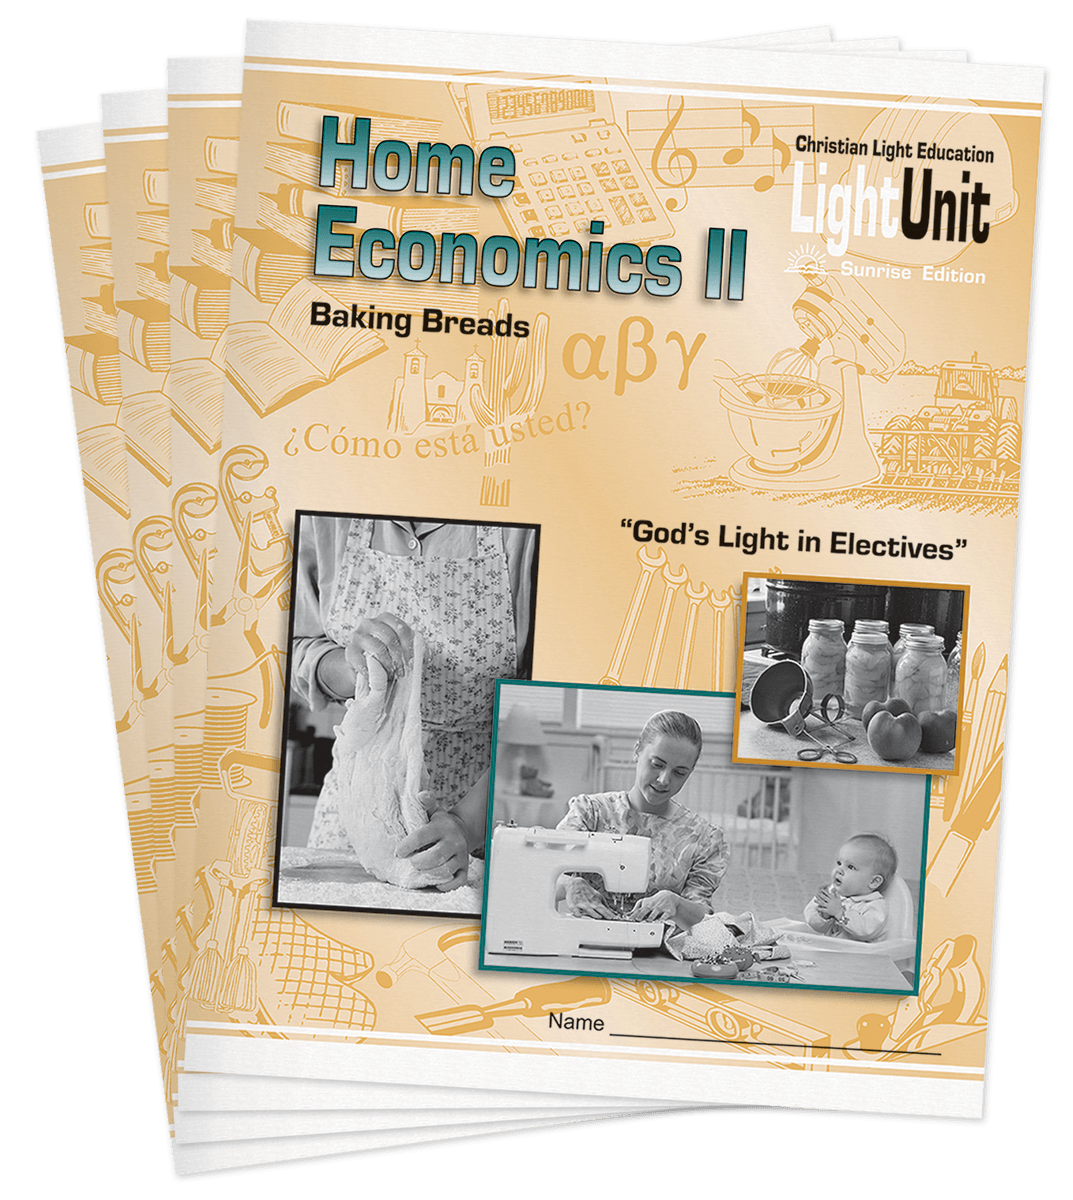 Home Economics II